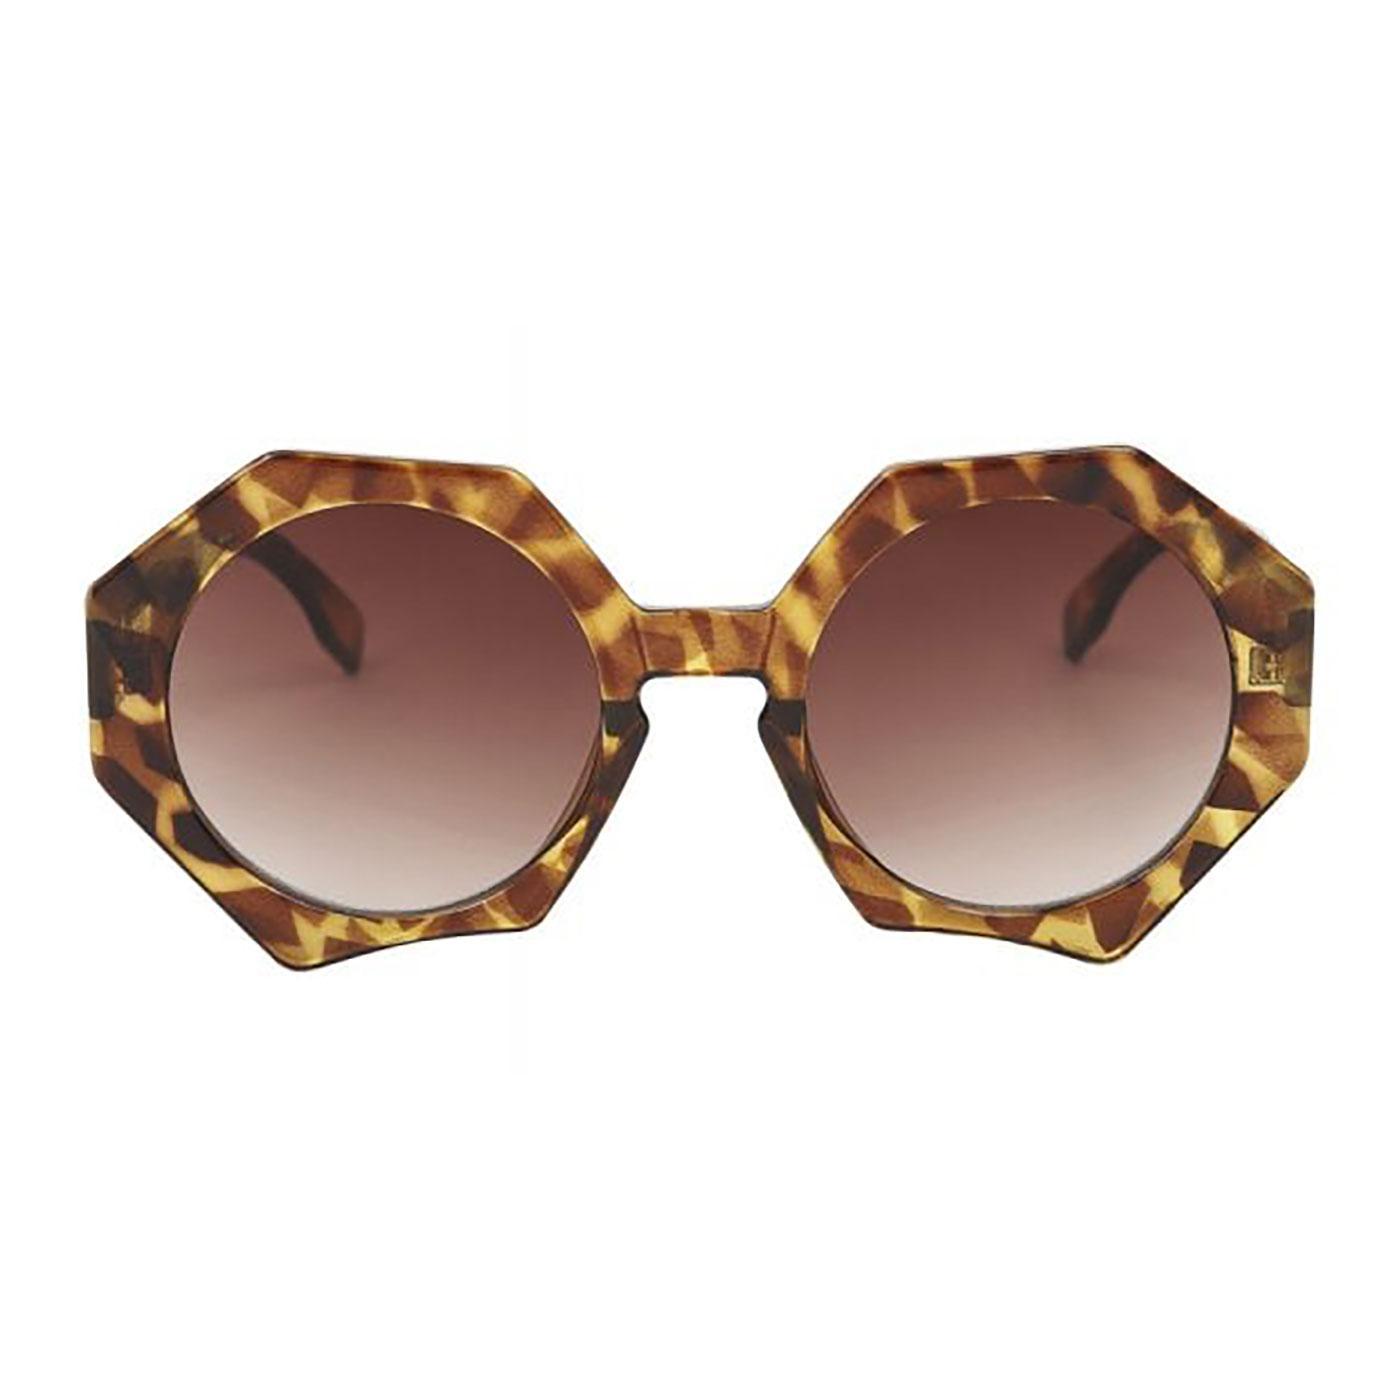 Janis COLLECTIF Retro 50s Vintage Look Sunglasses